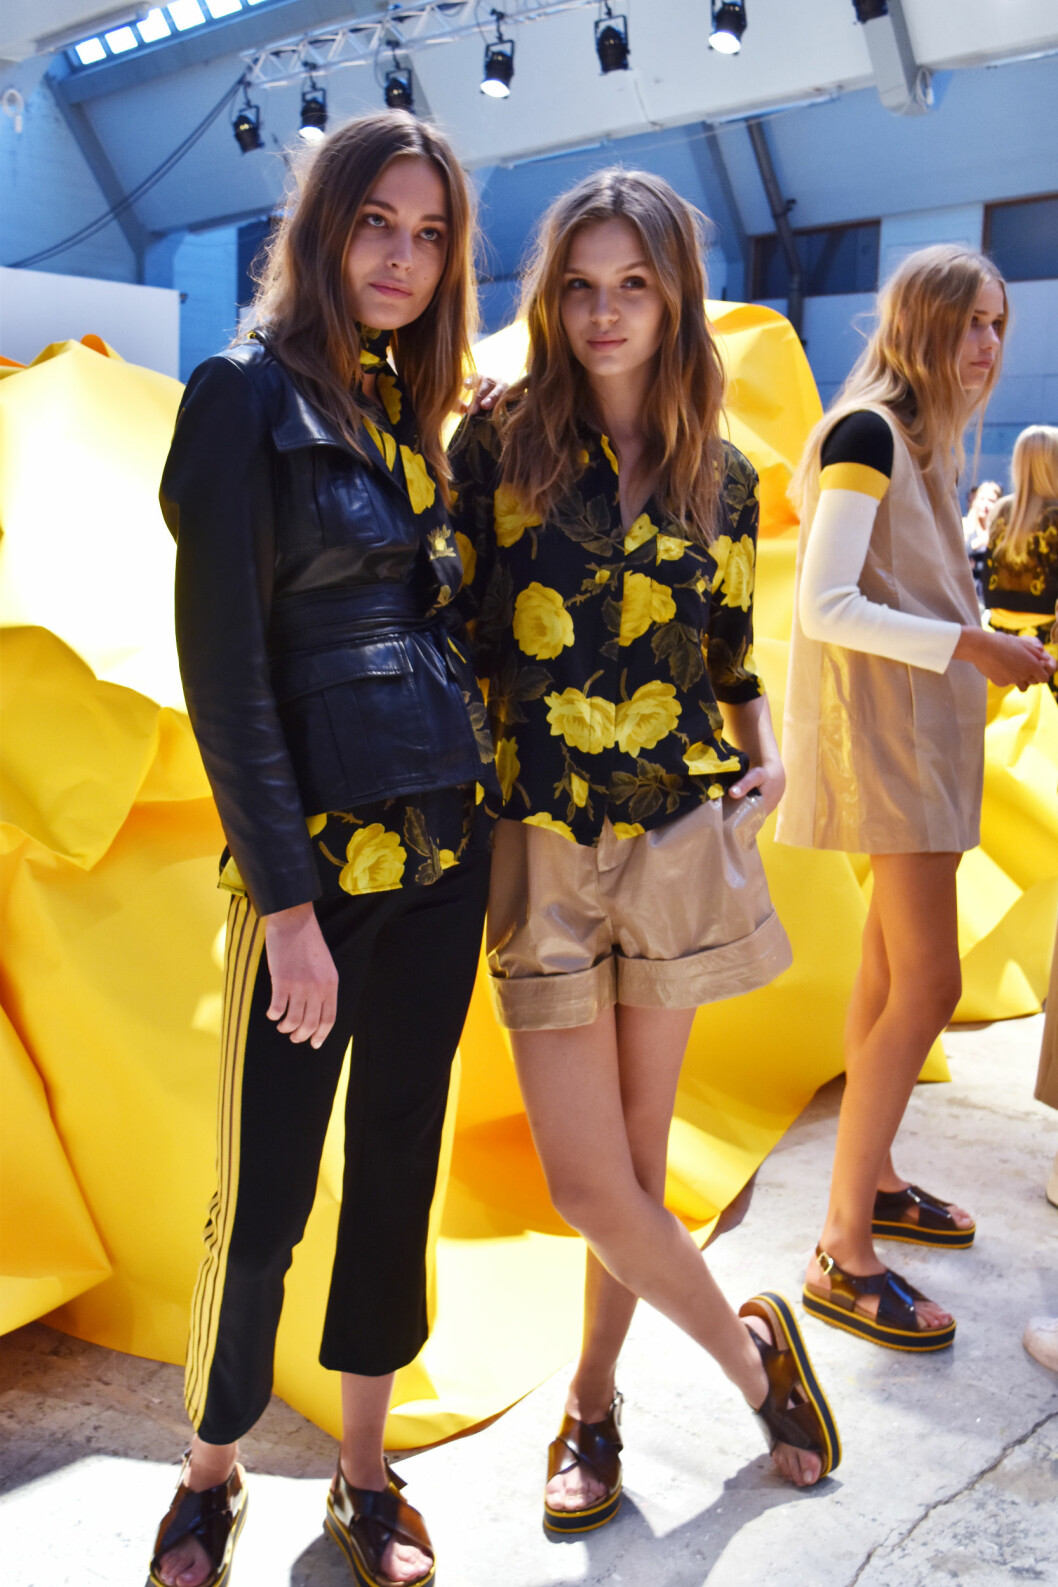 Nadja Bender til venstre går alt fra Chanel til Givenchy-visning. Idag hos Ganni åpnet hun showet med en lekker innsvinget skinnjakke som vi elsker.  Foto: Nathalie Helgerud